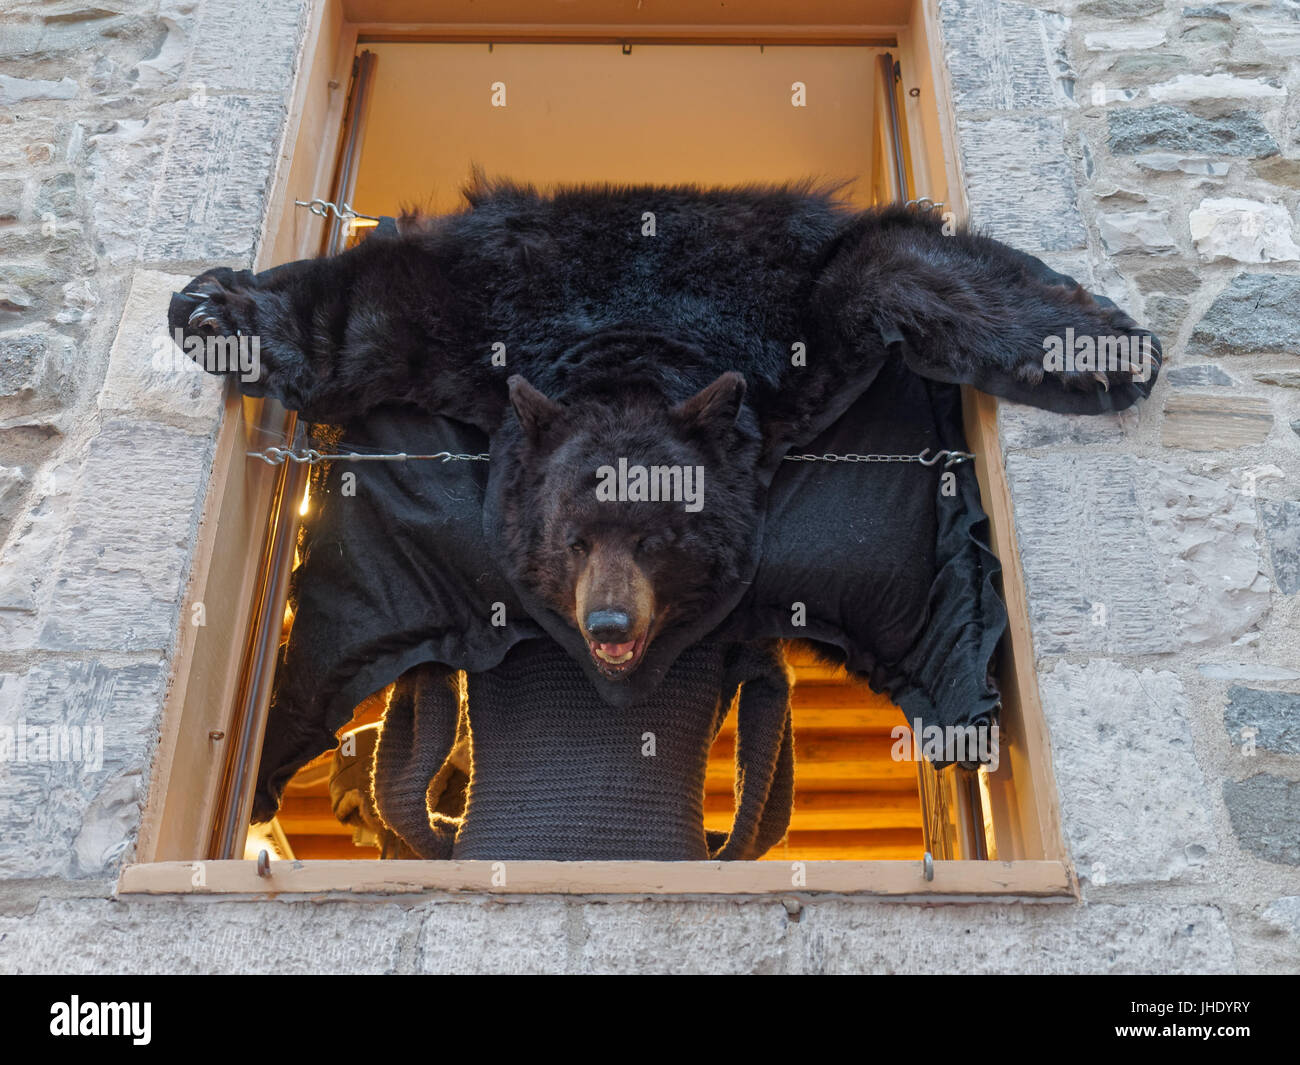 A bear skin rug - Stock Image